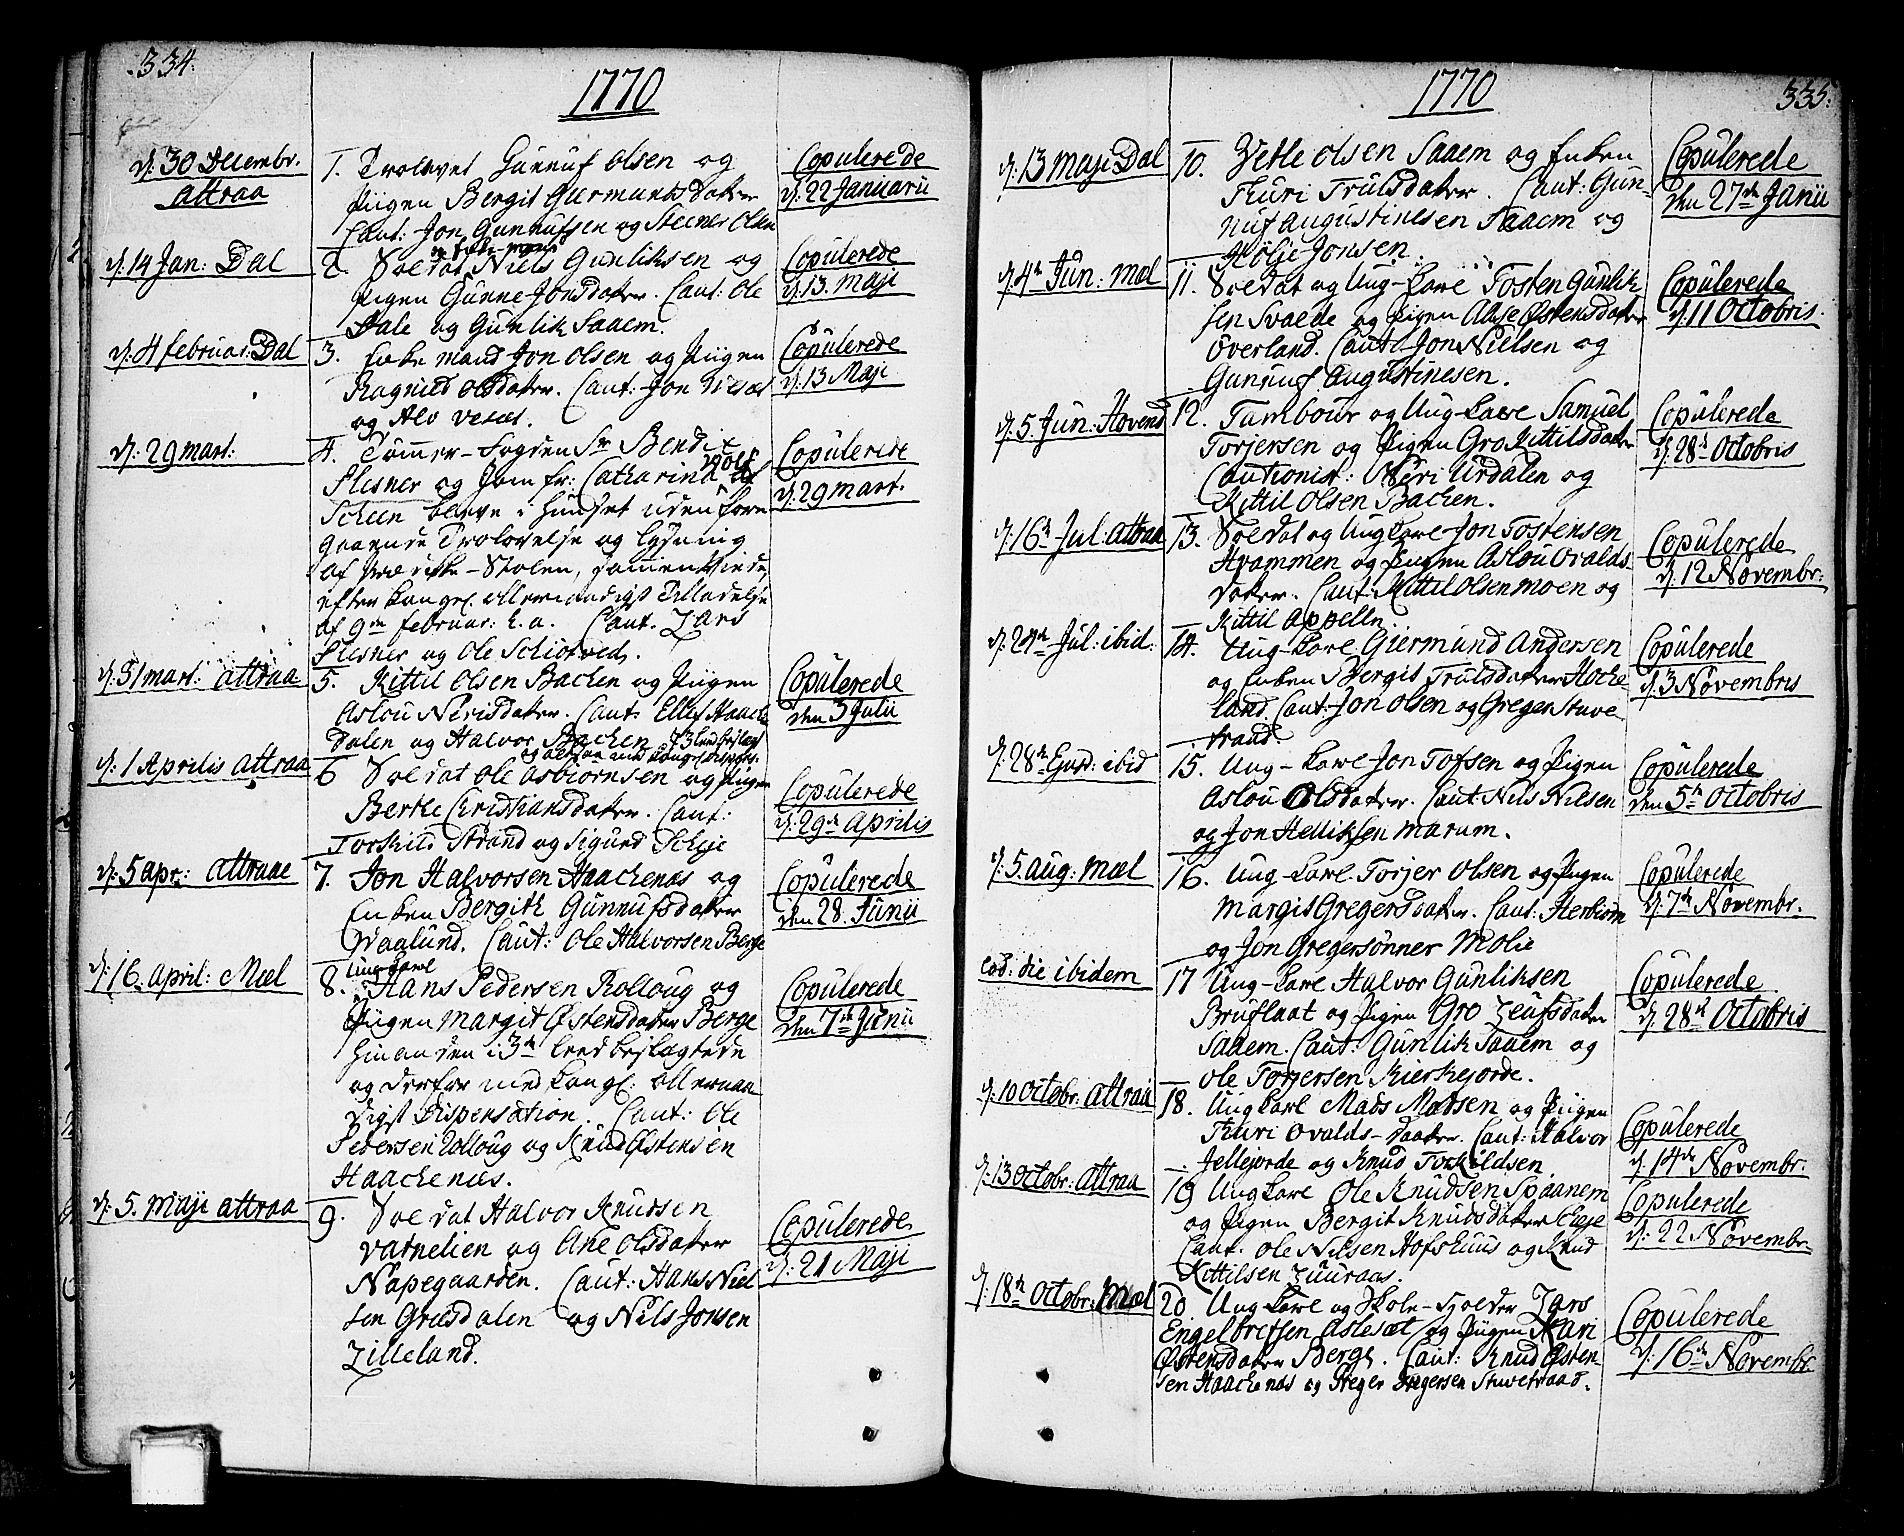 SAKO, Tinn kirkebøker, F/Fa/L0002: Ministerialbok nr. I 2, 1757-1810, s. 334-335